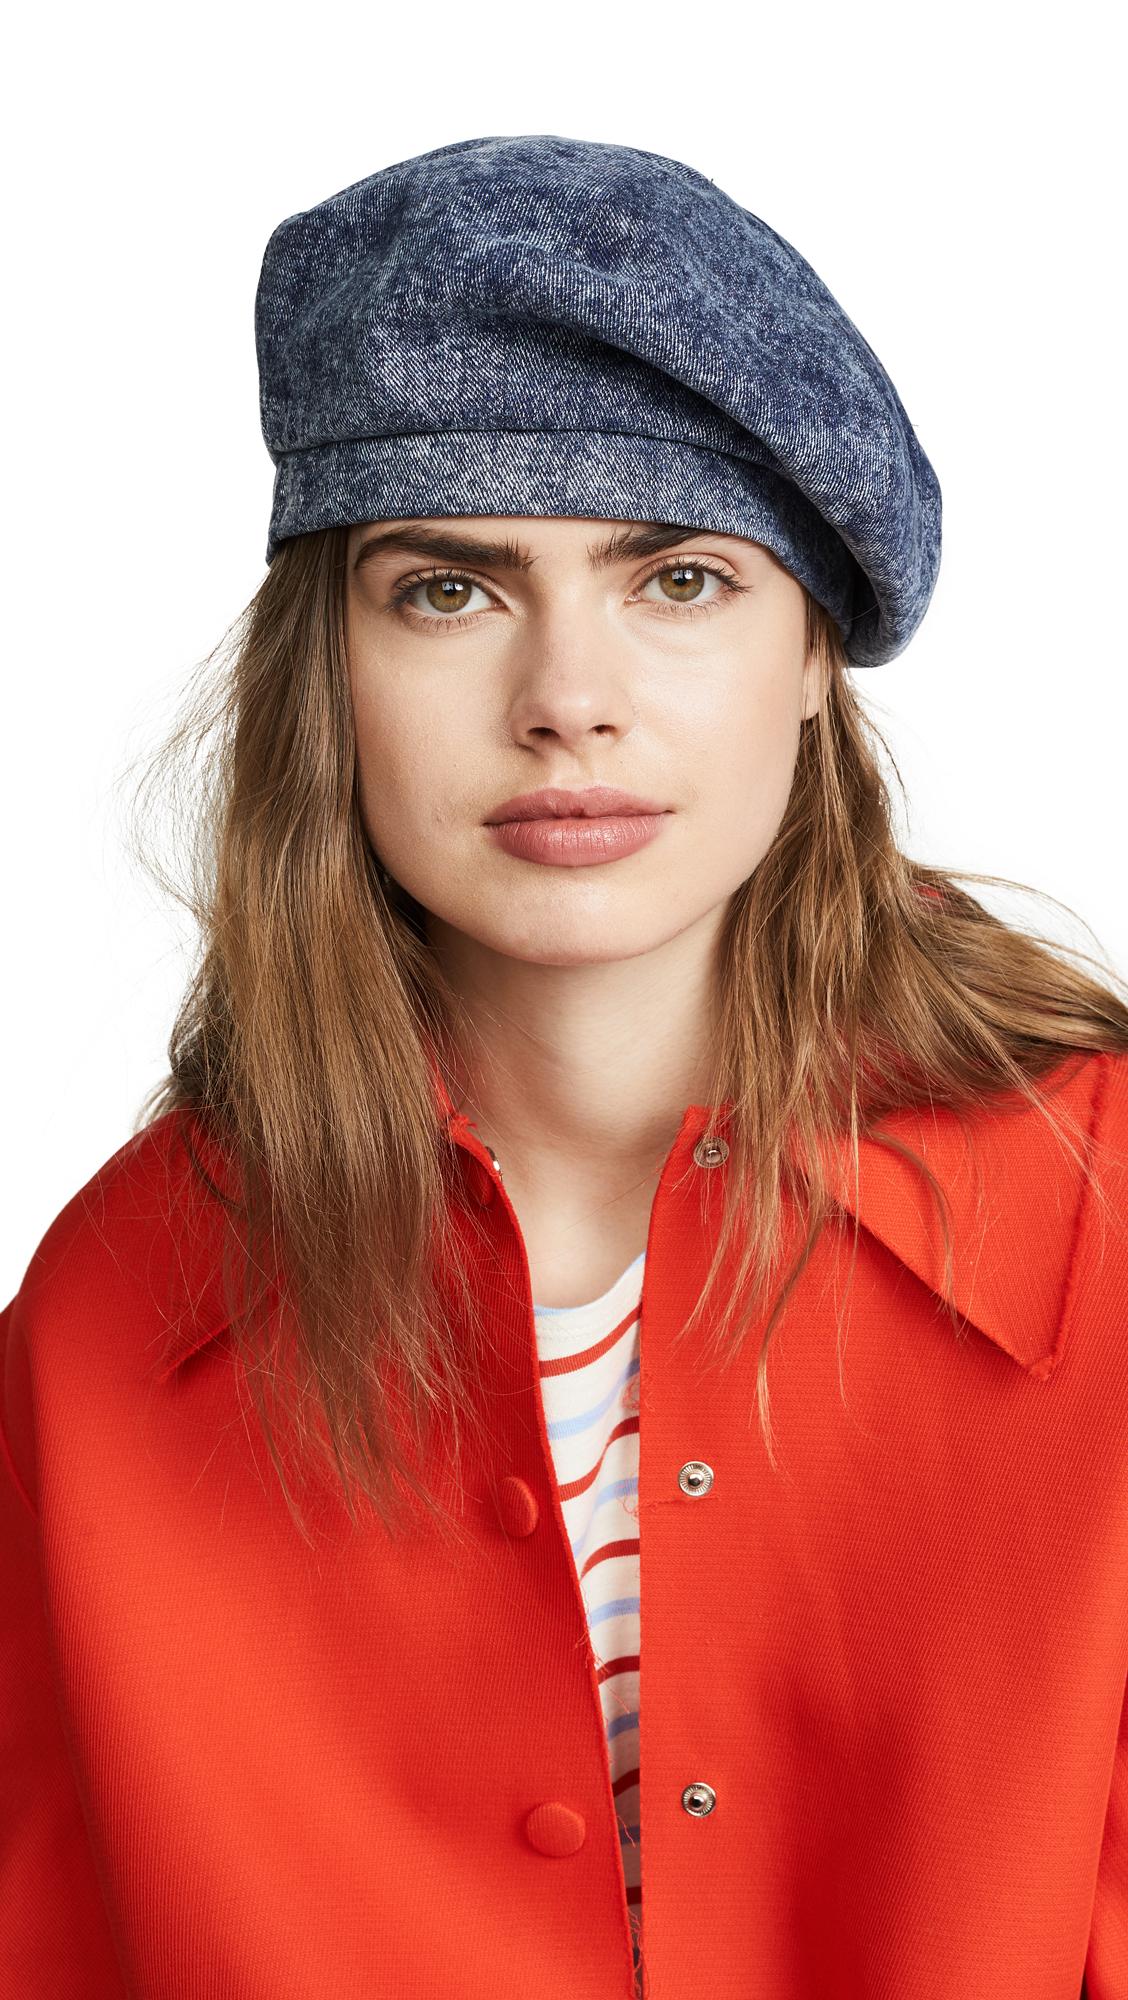 CHLOE HAT